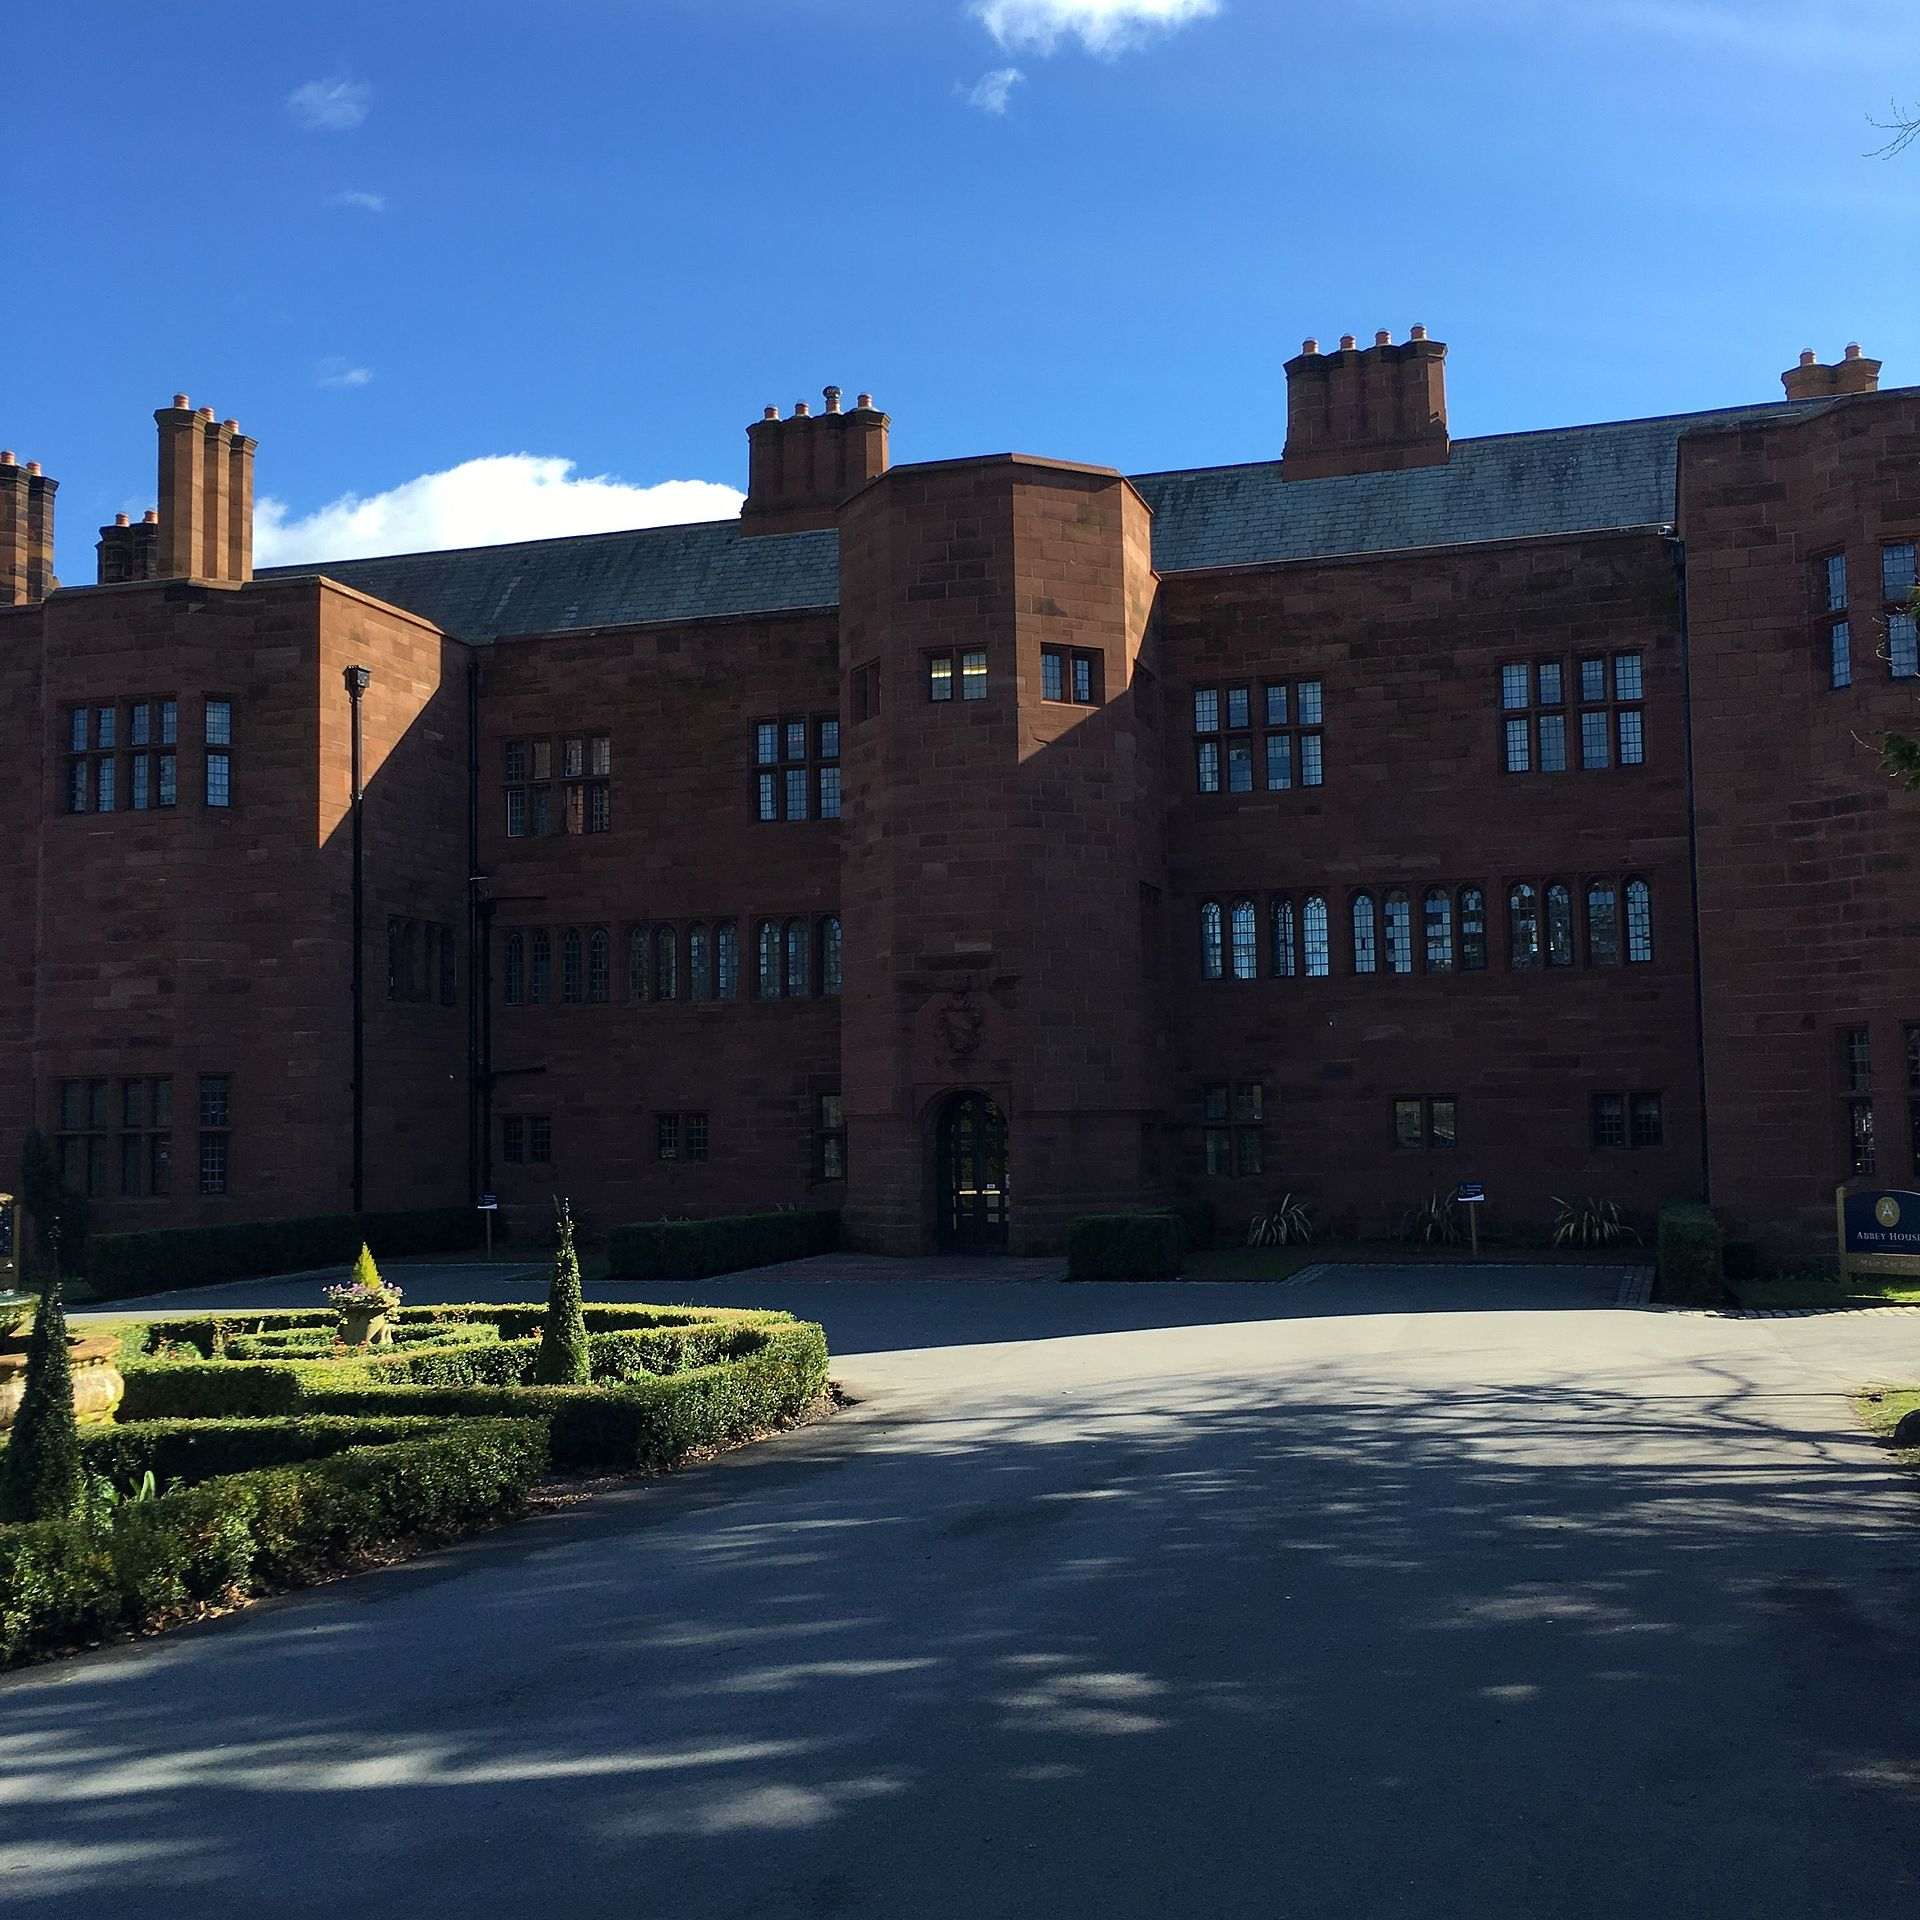 Abbey House Hotel And Gardens Barrow In Furneb